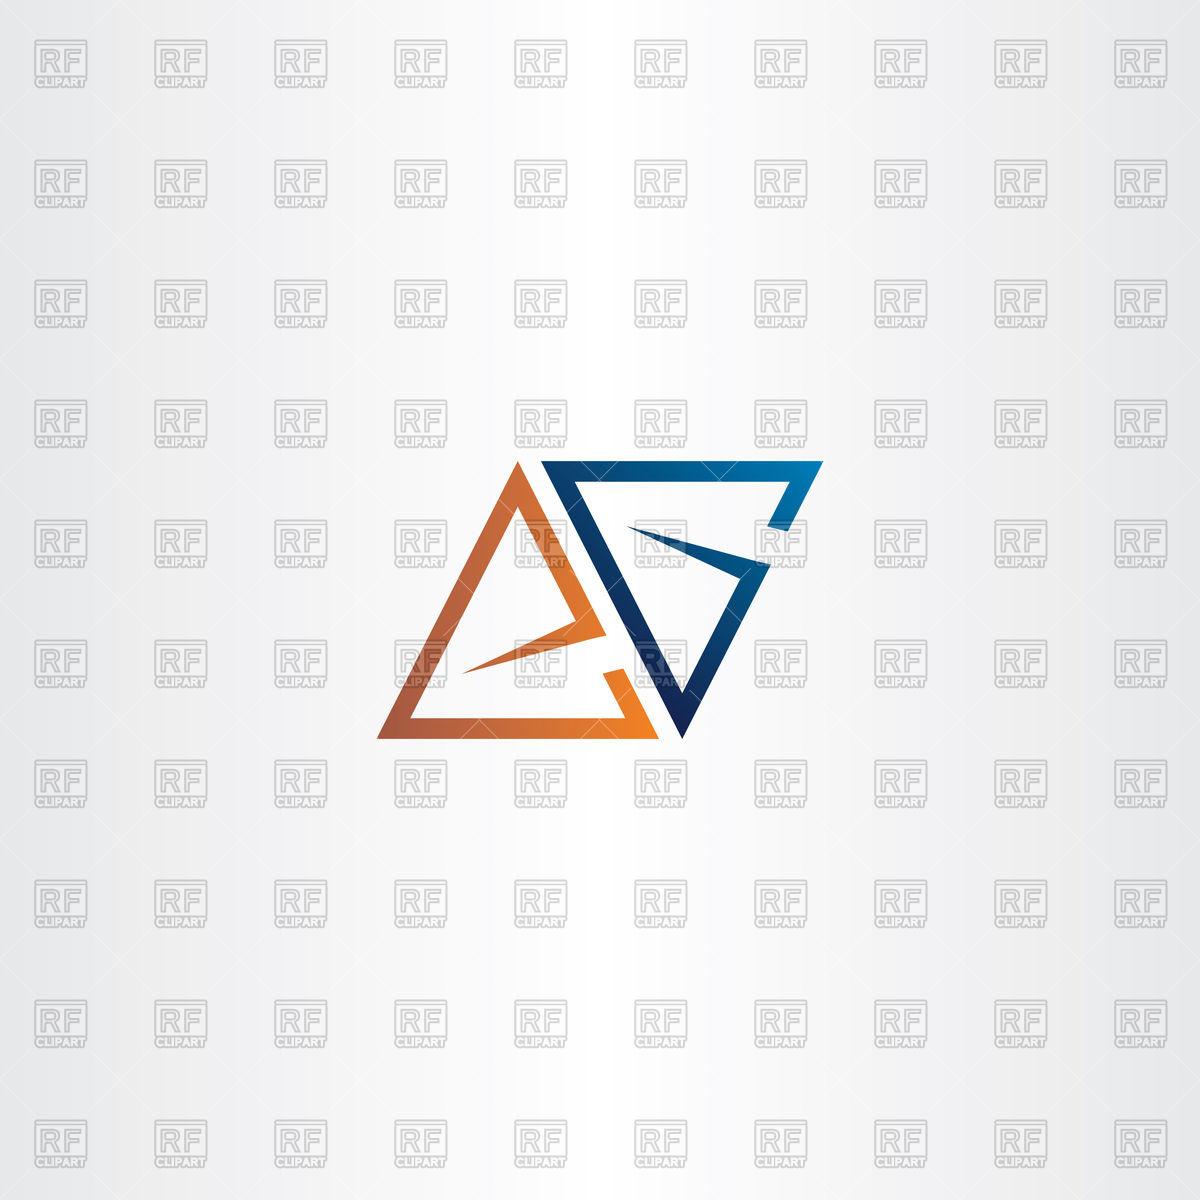 1200x1200 Letter A Or E Logo Vector Image Vector Artwork Of Signs, Symbols